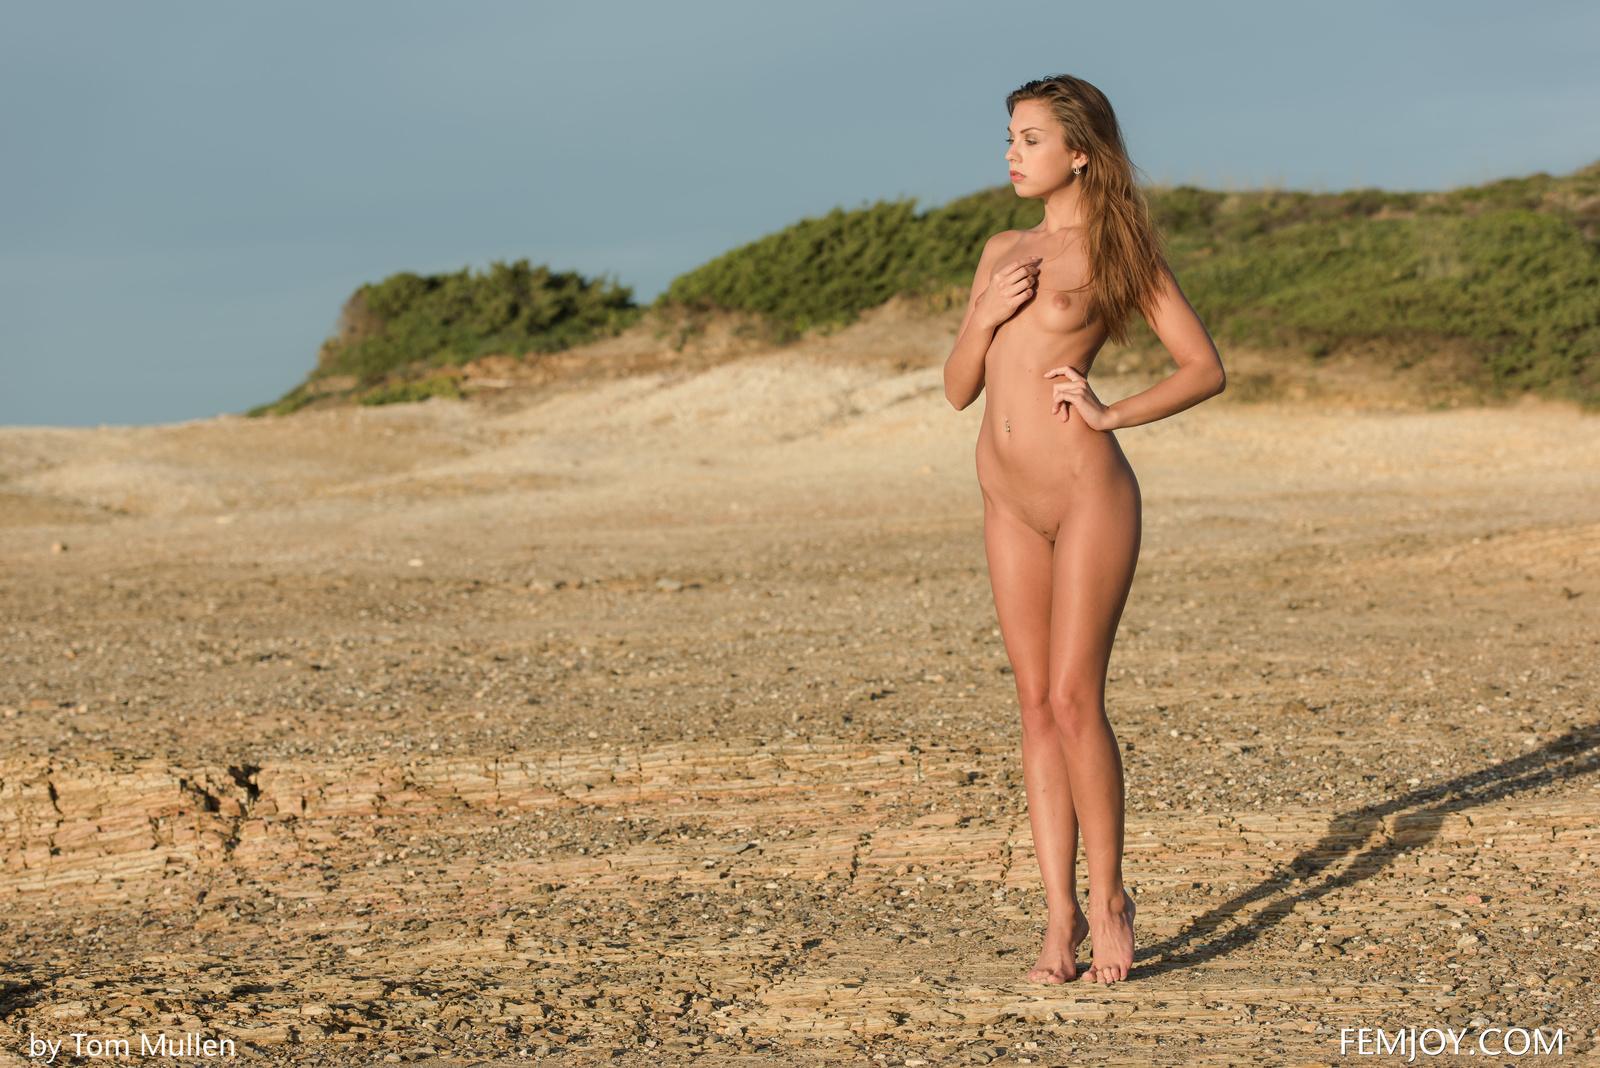 Zdjęcie porno - 0918 - Malutka brunetka na piasku